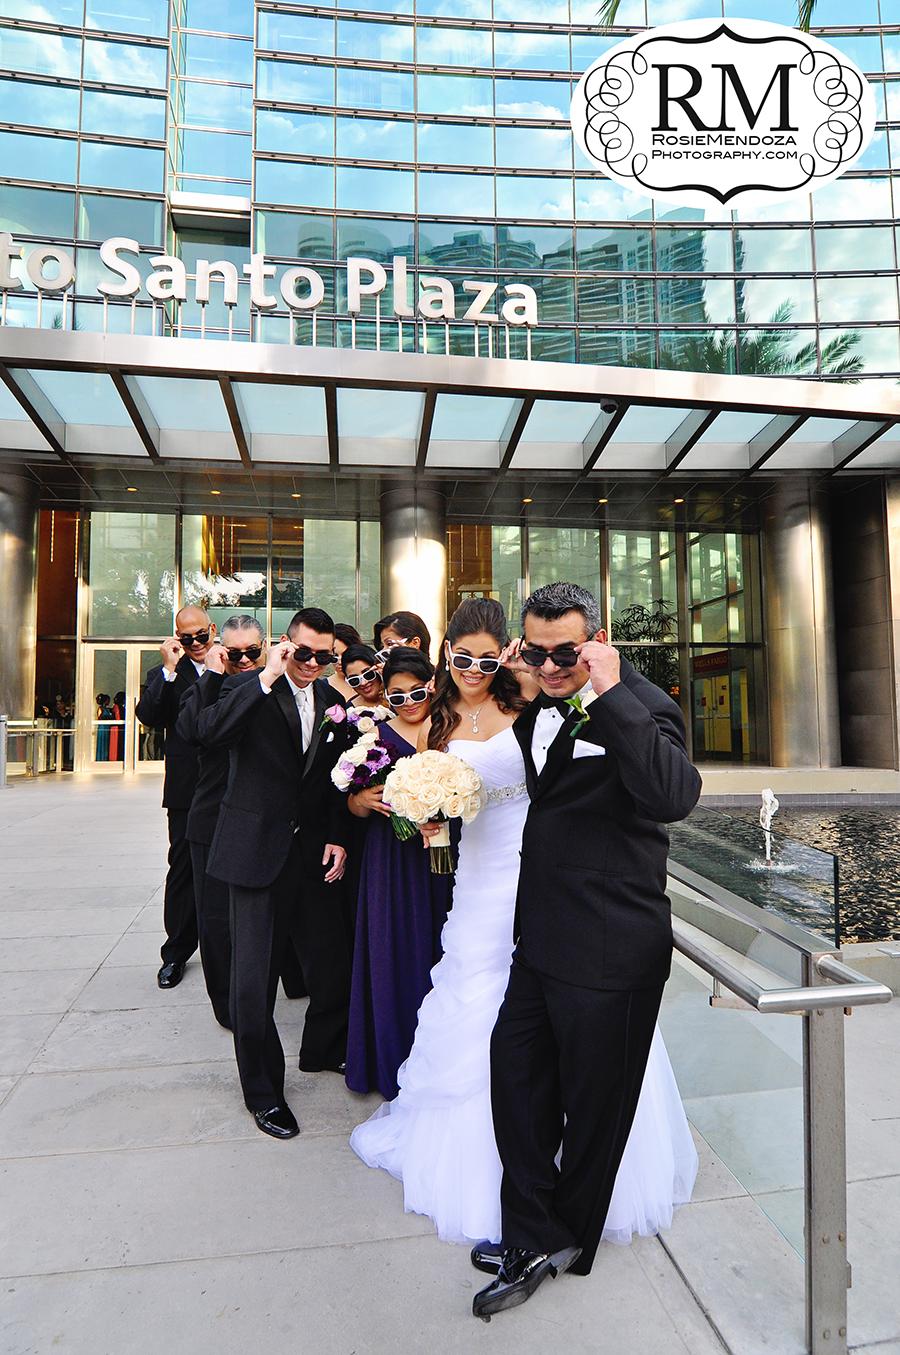 Conrad-Miami-wedding-portrait-photo